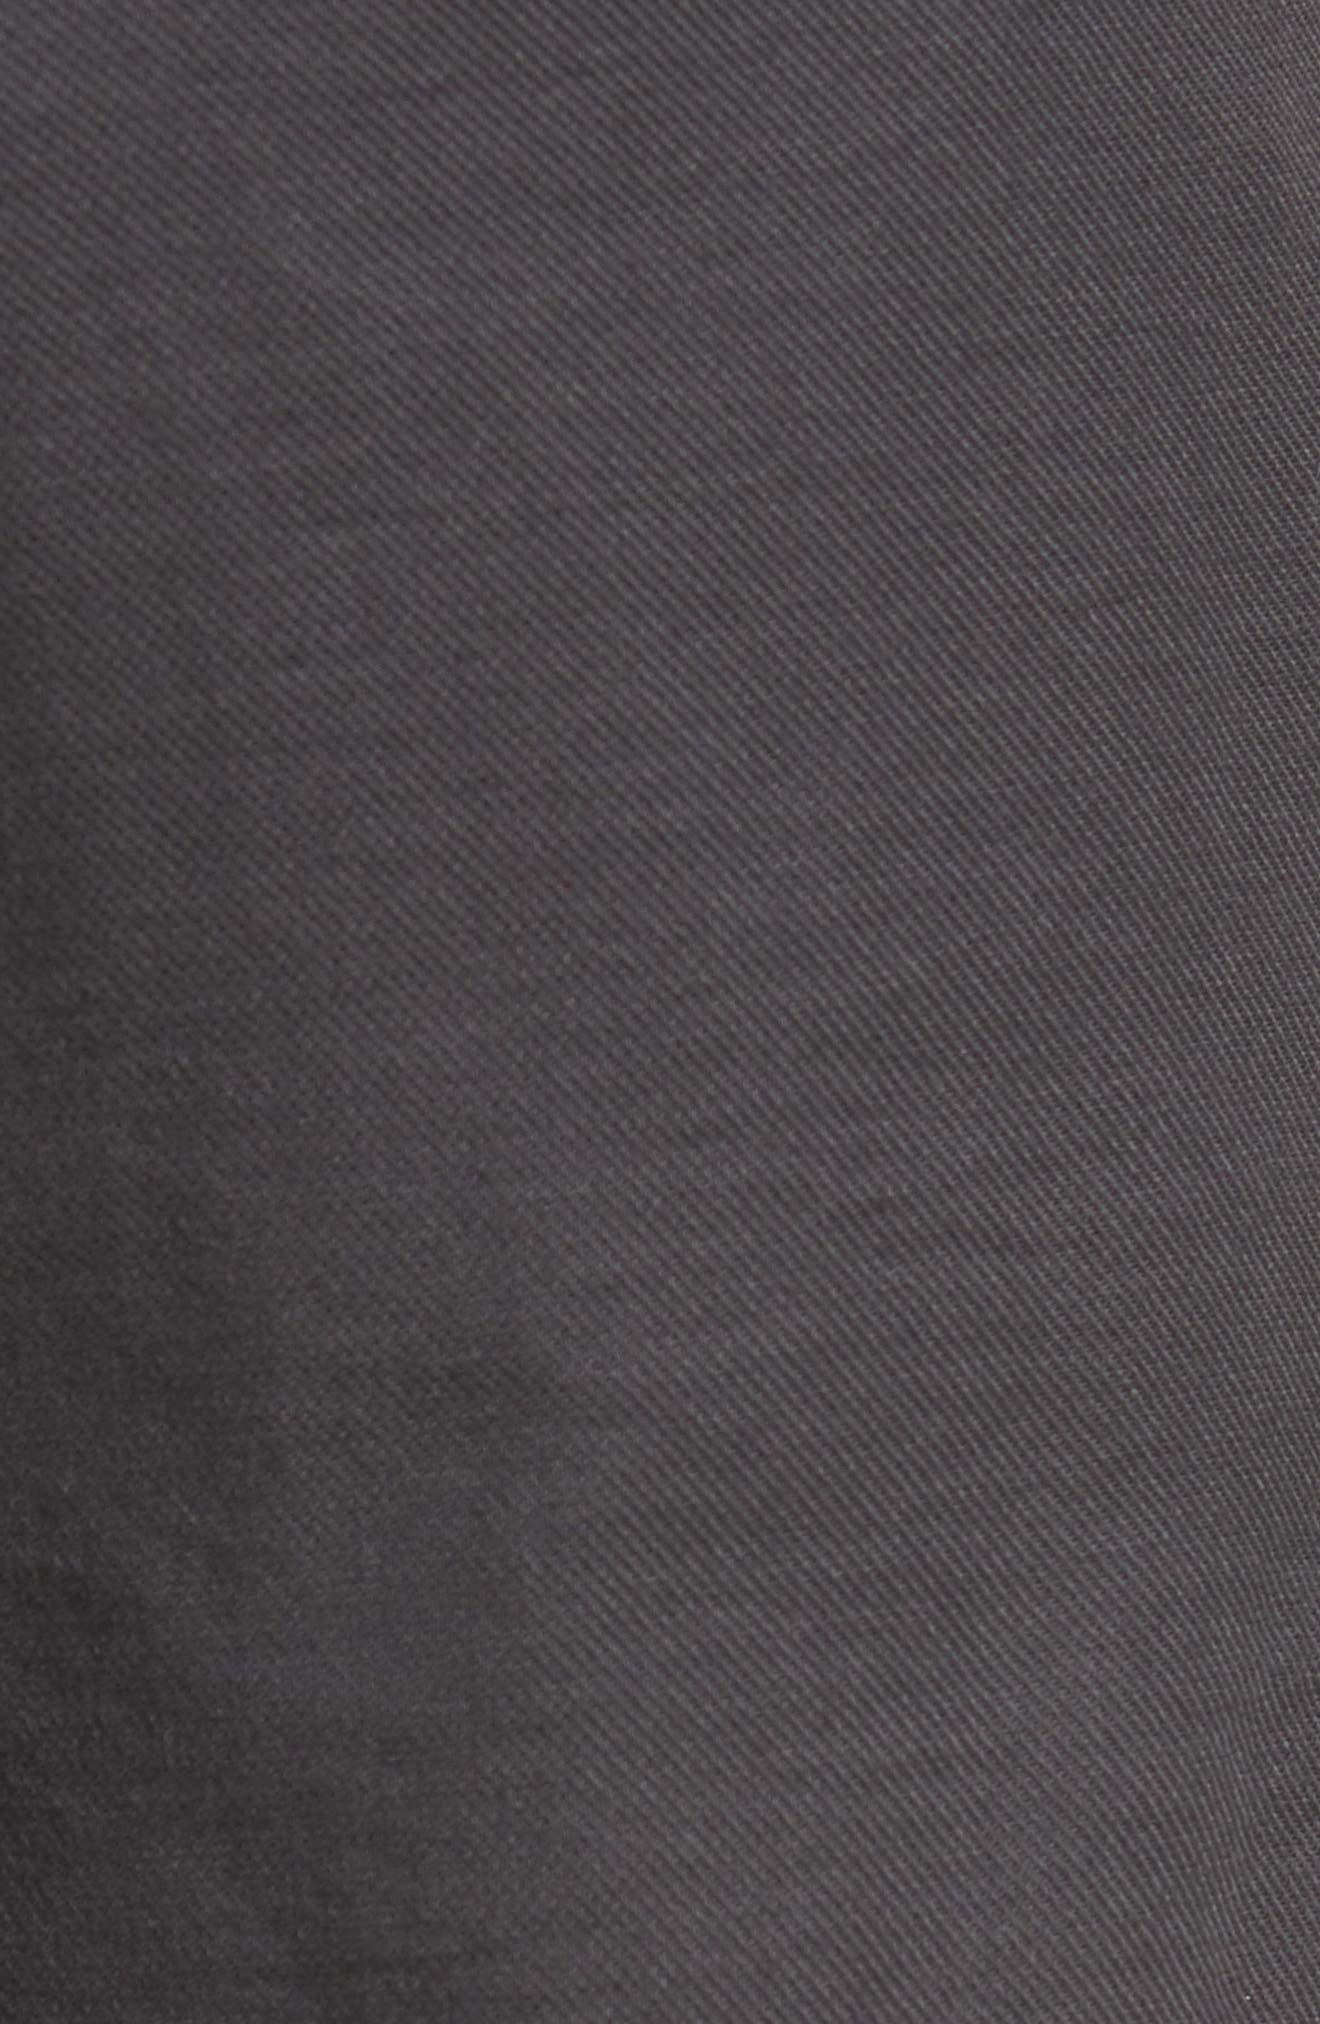 Edgewood Cargo Shorts,                             Alternate thumbnail 5, color,                             050